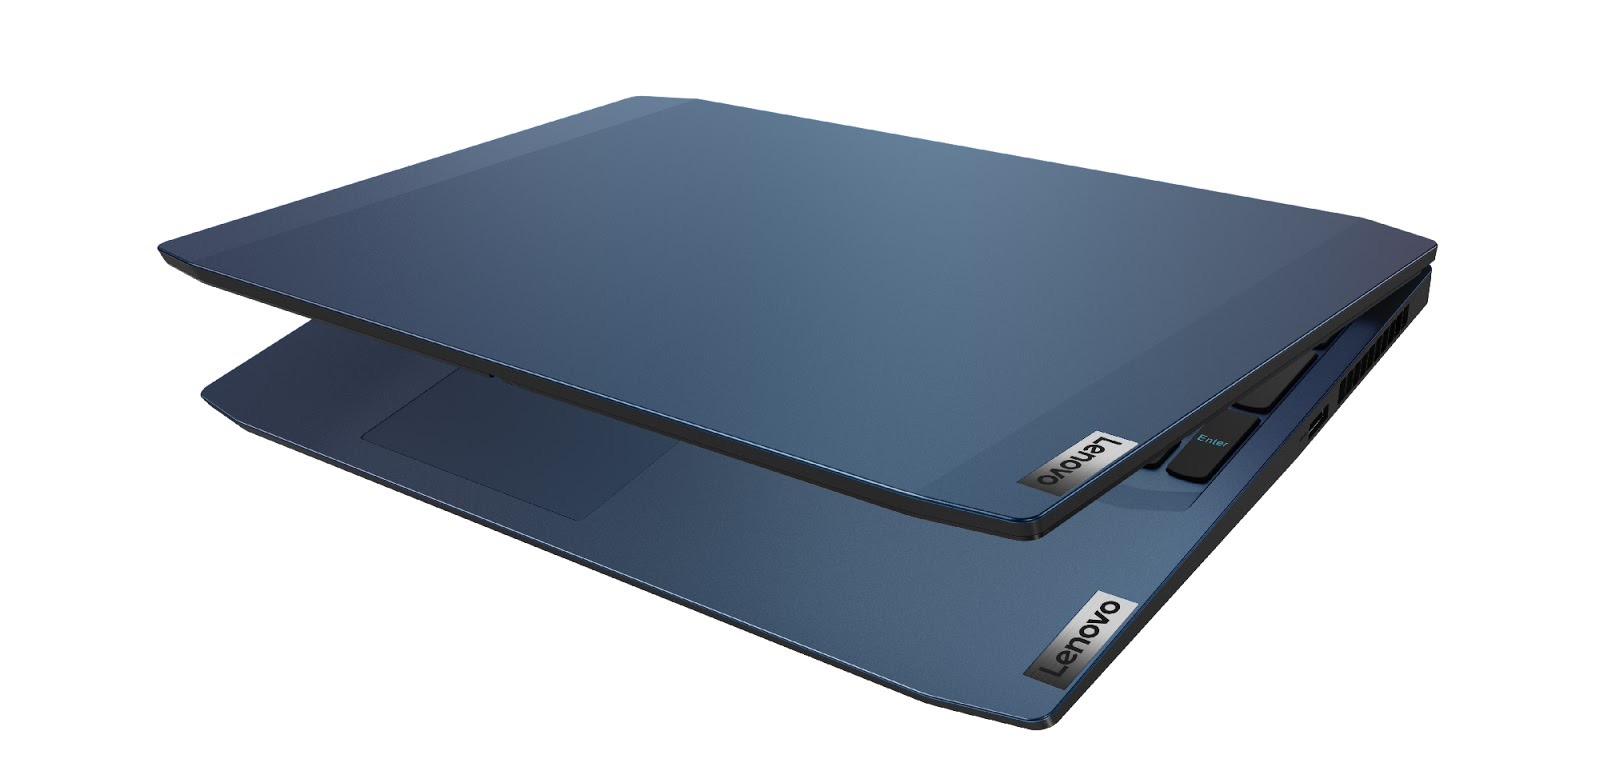 Фото 3. Ноутбук Lenovo ideapad Gaming 3 15IMH05 Chameleon Blue (81Y400L3RK)